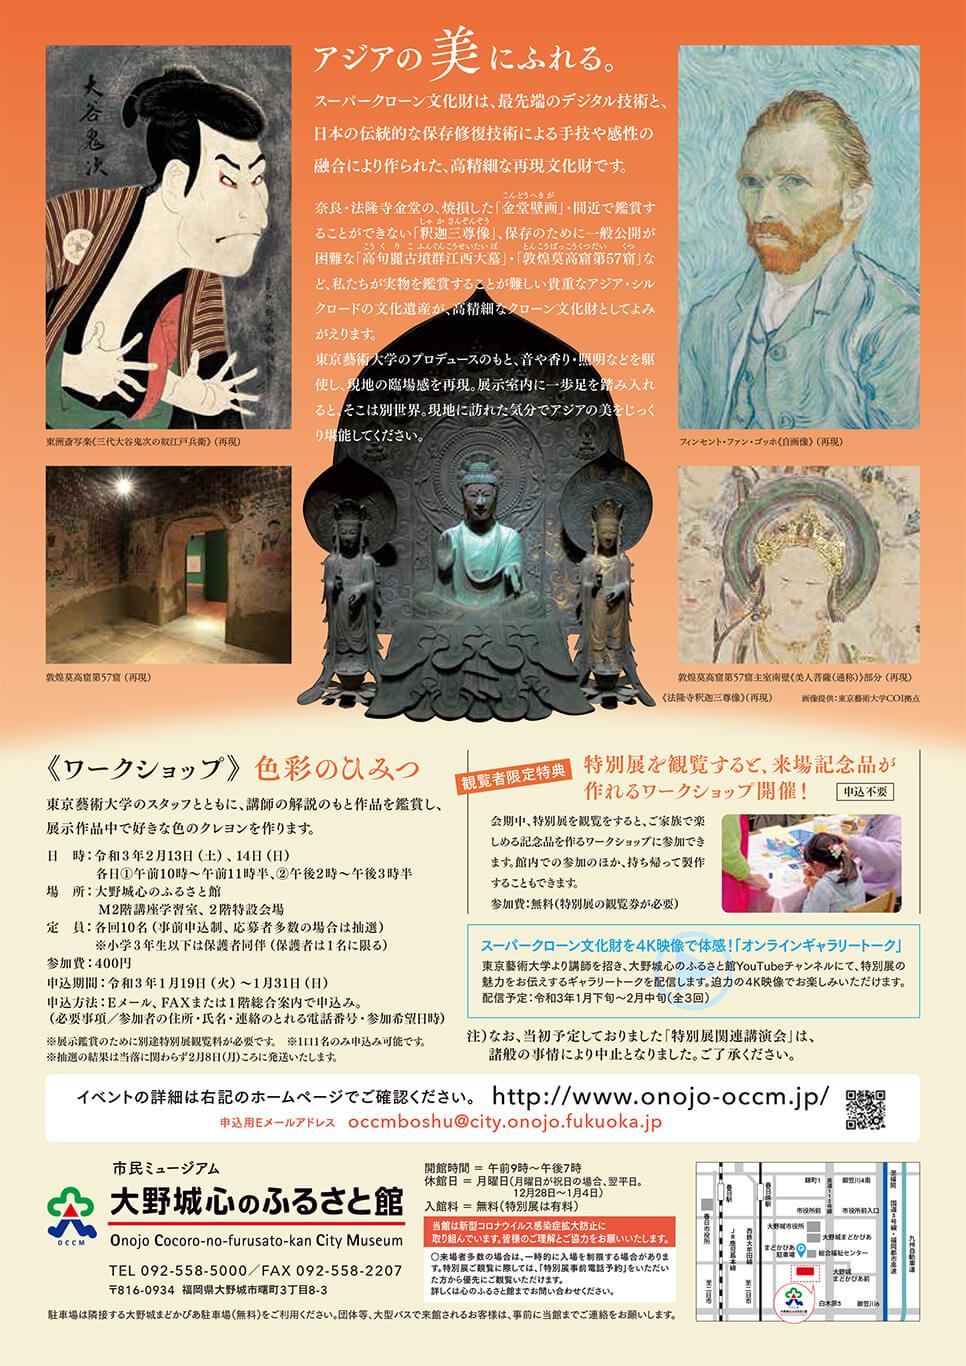 occm-202101-東京藝術大学スーパークローン文化財展